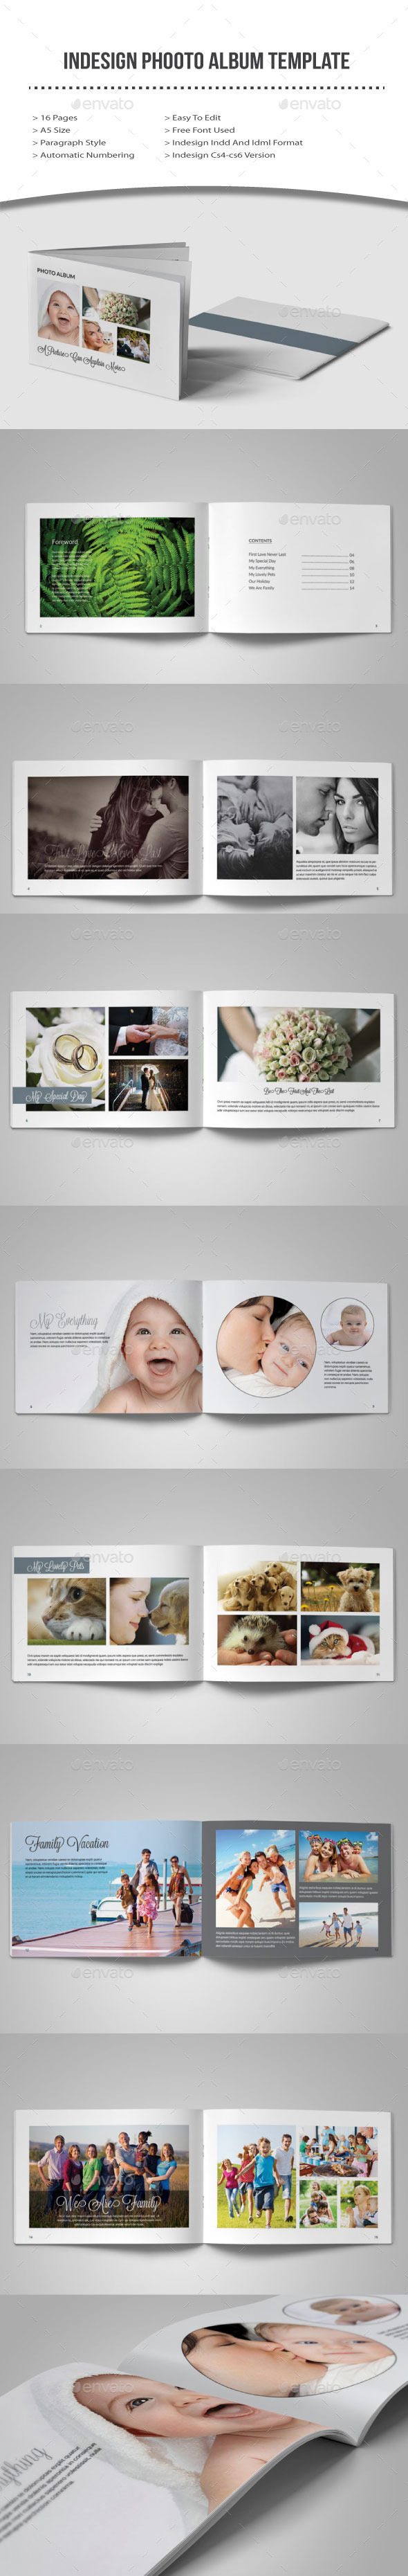 Indesign  Photo Album Template - Photo Albums Print Templates